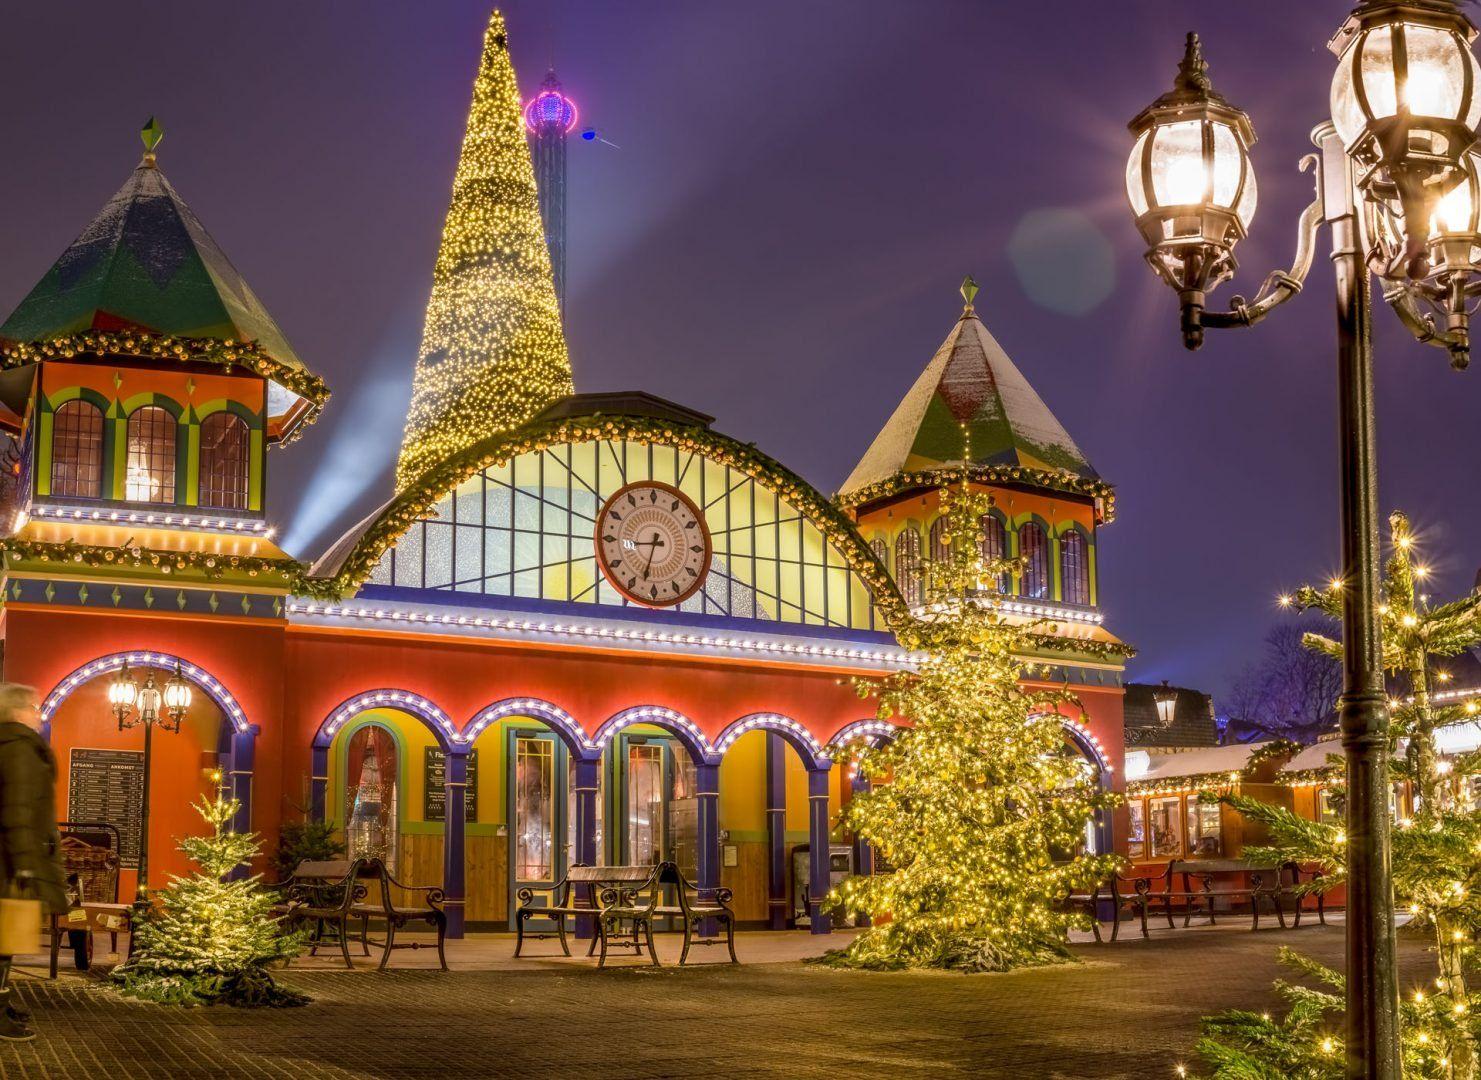 2021 Washington Christmas Bazaar 20 Of The Most Picturesque Christmas Destinations Rough Guides